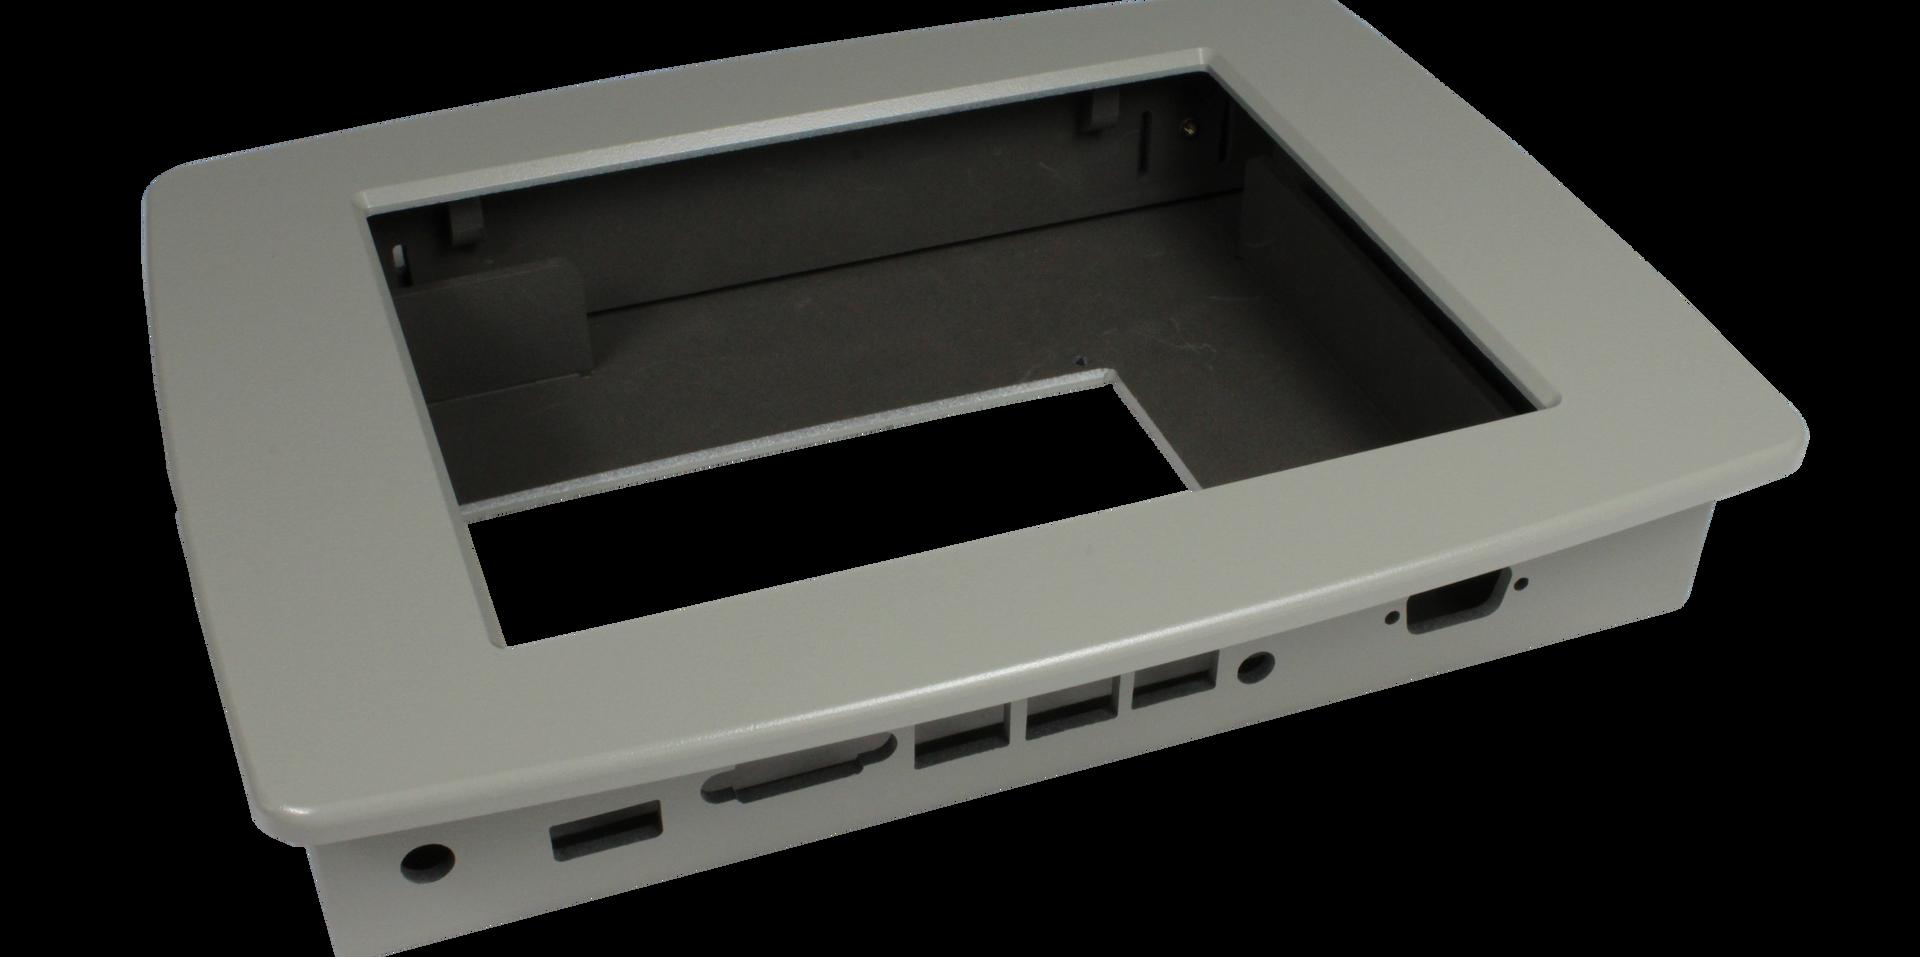 Custom ABS touchscreen enclosure